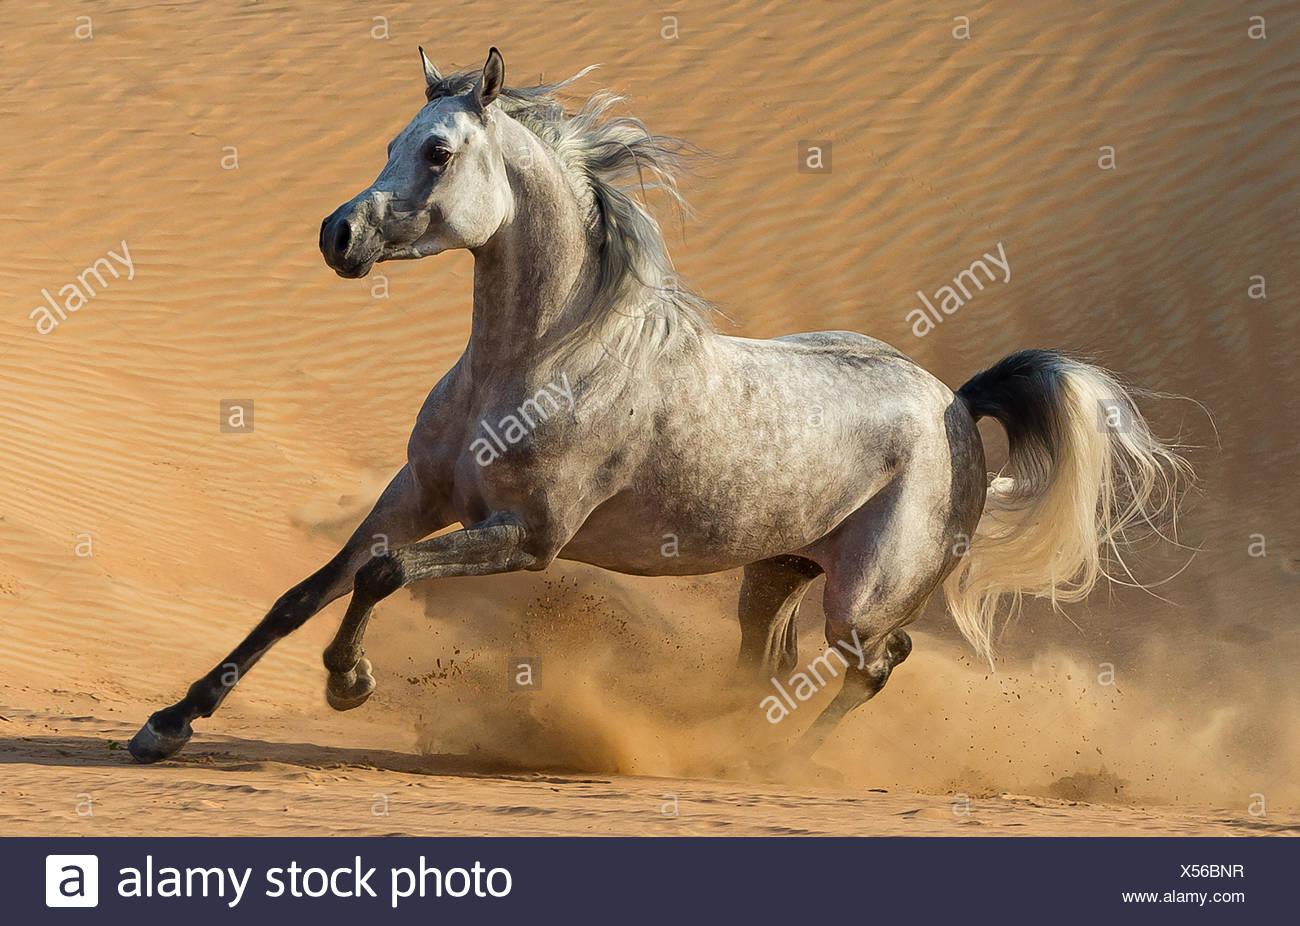 Dapple grey Arabian stallion running in desert dunes near Dubai, United Arab Emirates. - Stock Image